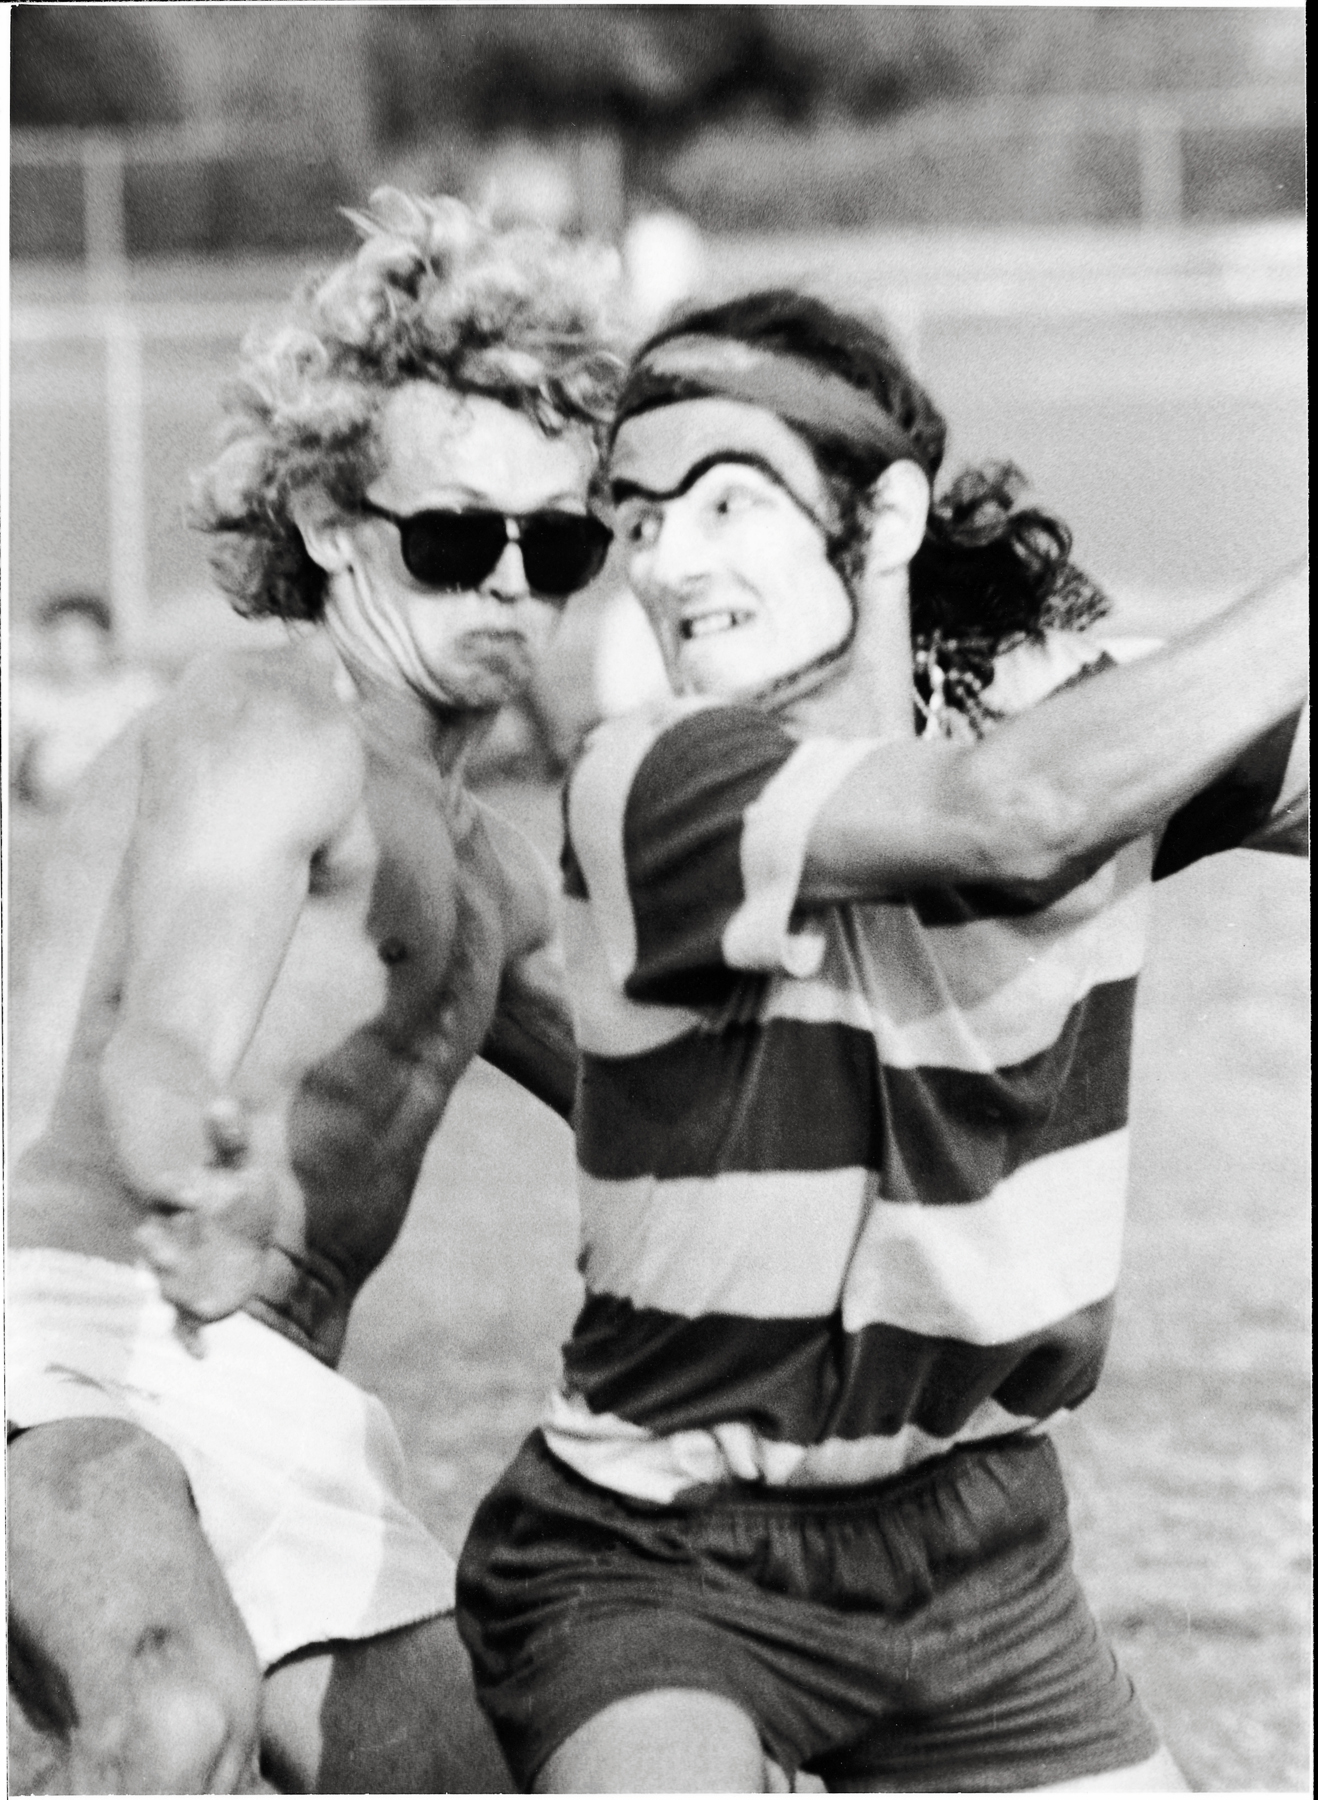 '79 Dan Weiss & Steve Rieck